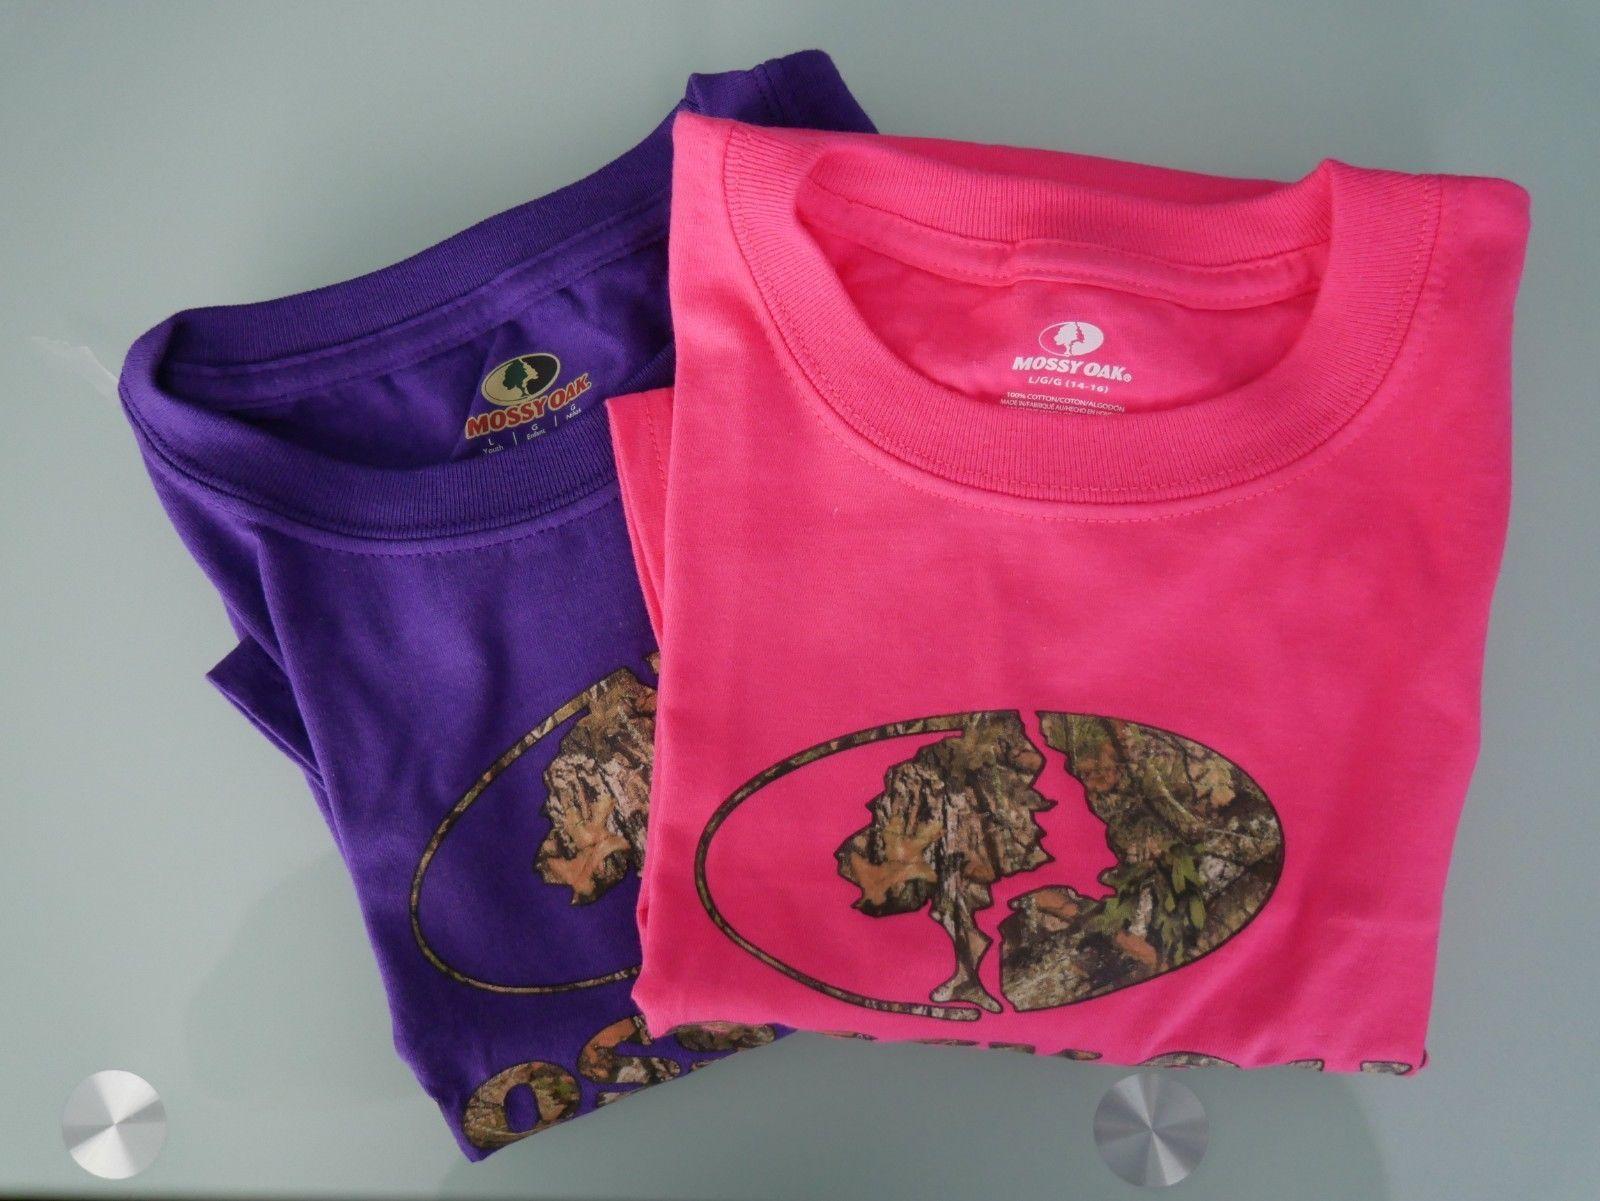 NWT I Love Santa Long Sleeve T-shirt 10-12 Girls Size Large